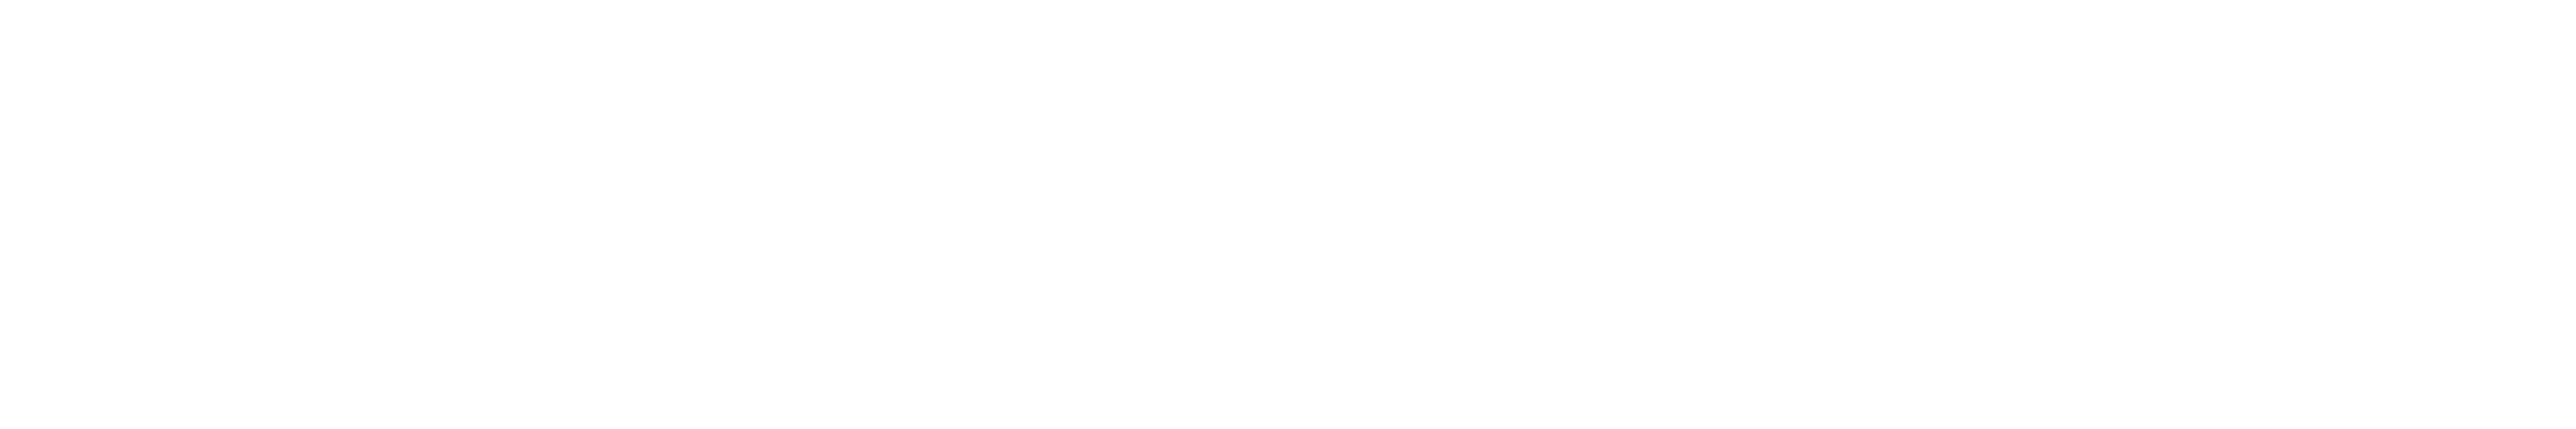 Gebrauchte Tresore kaufen | Faust-Tresor.de